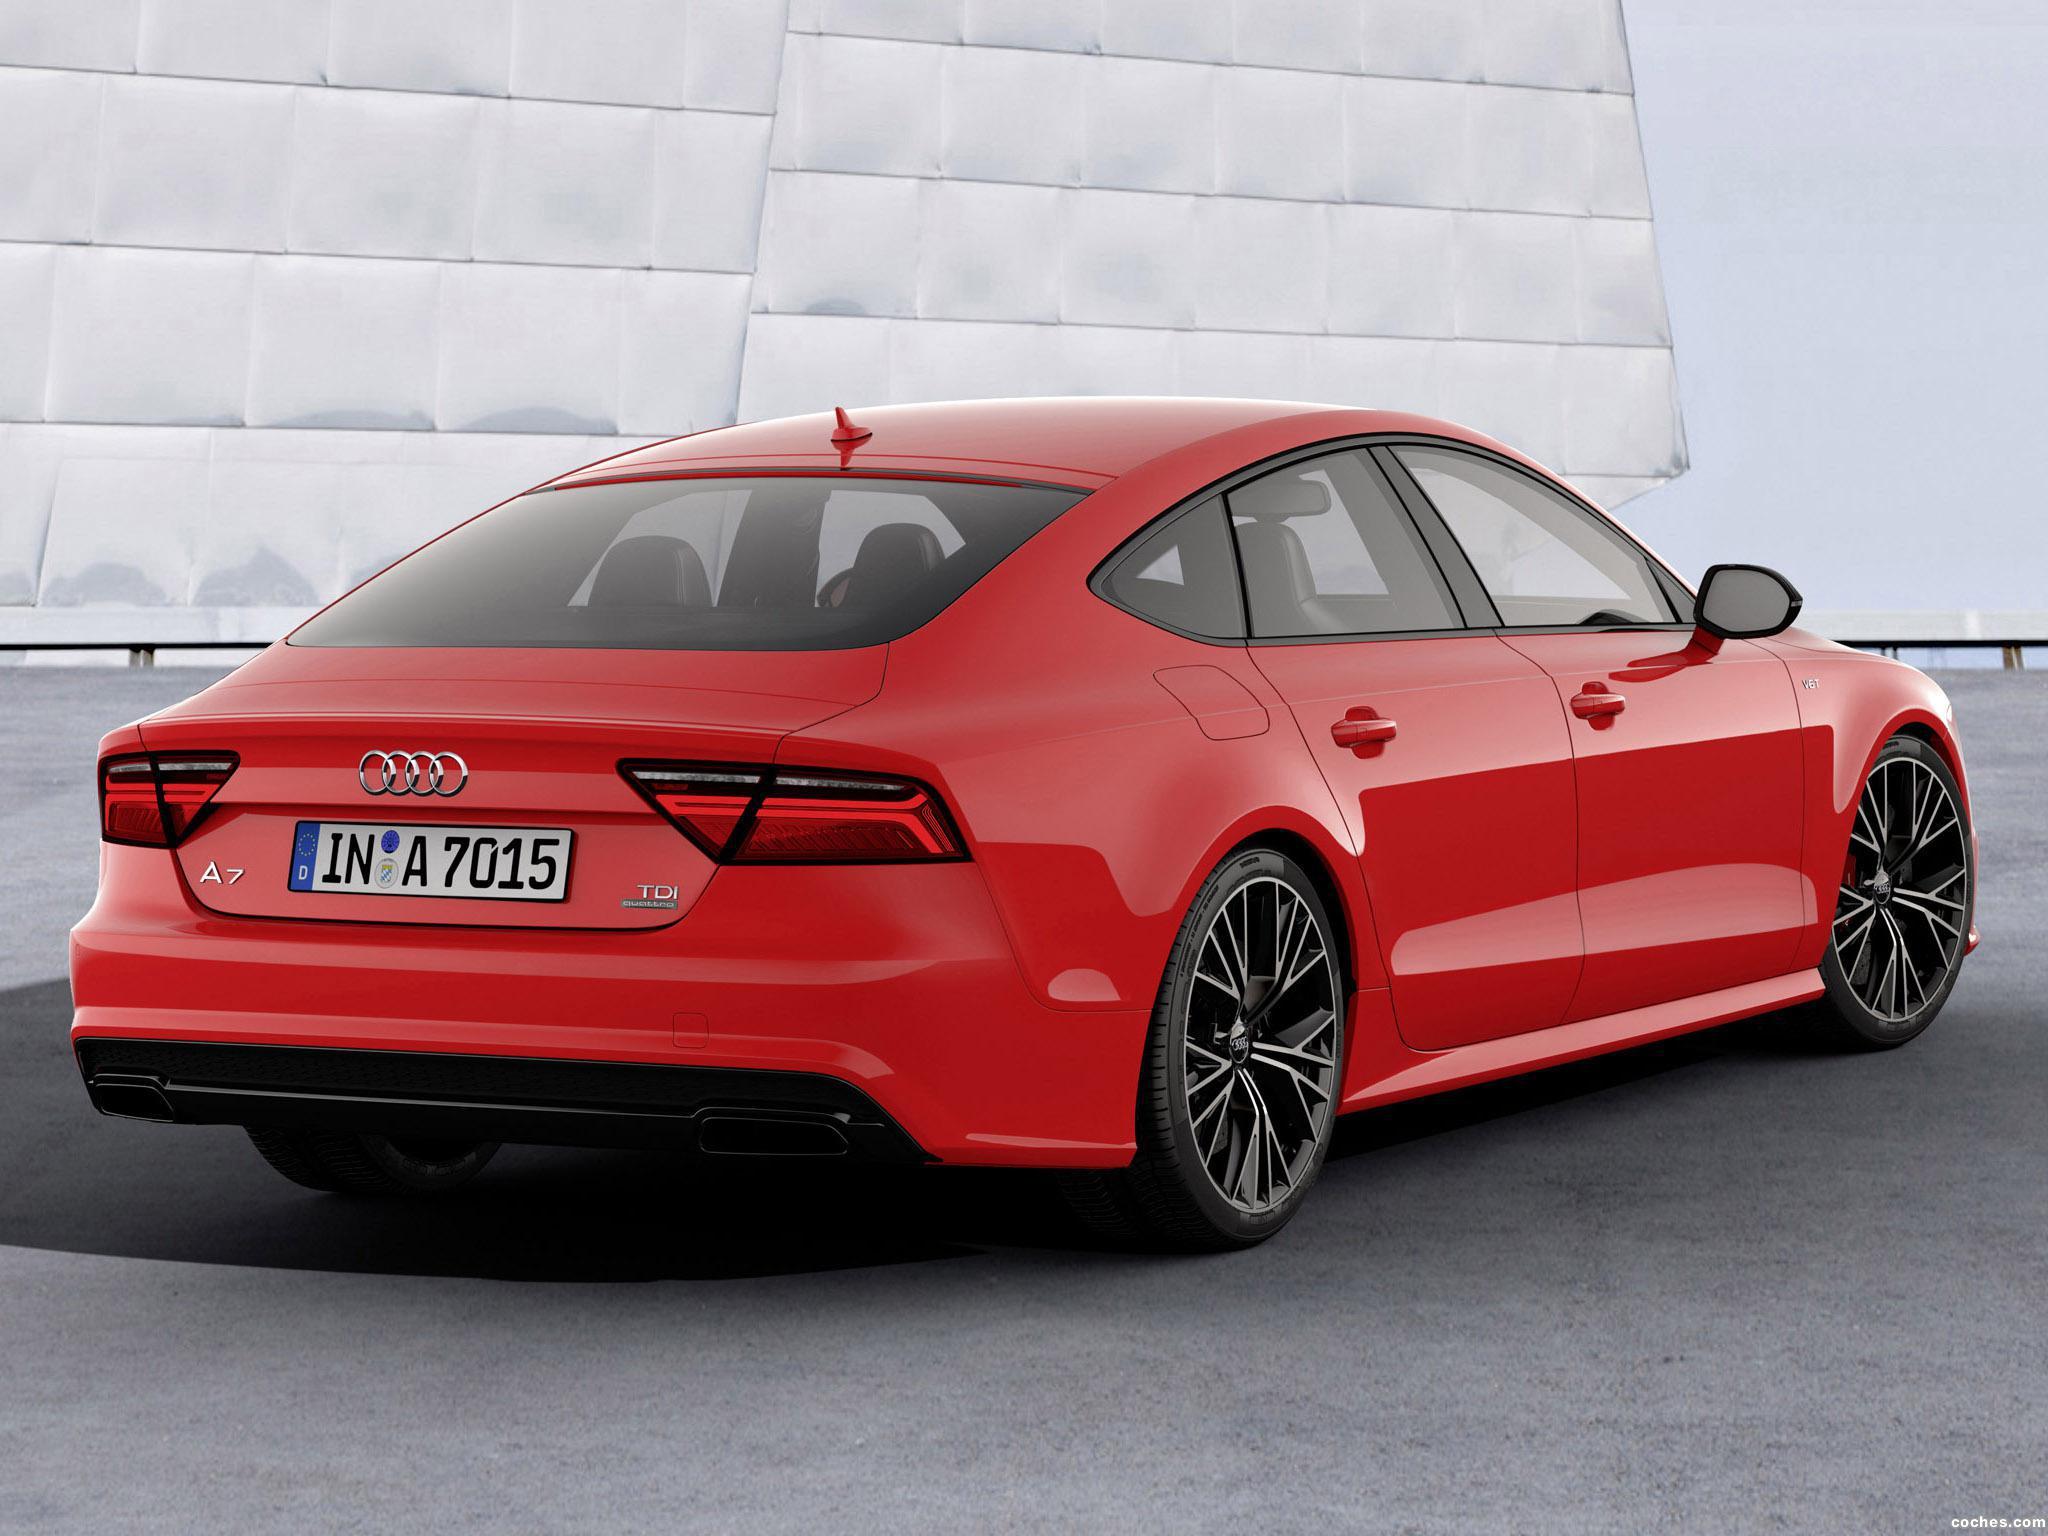 Foto 1 de Audi A7 Sportback 3.0 TDI Competition 2014